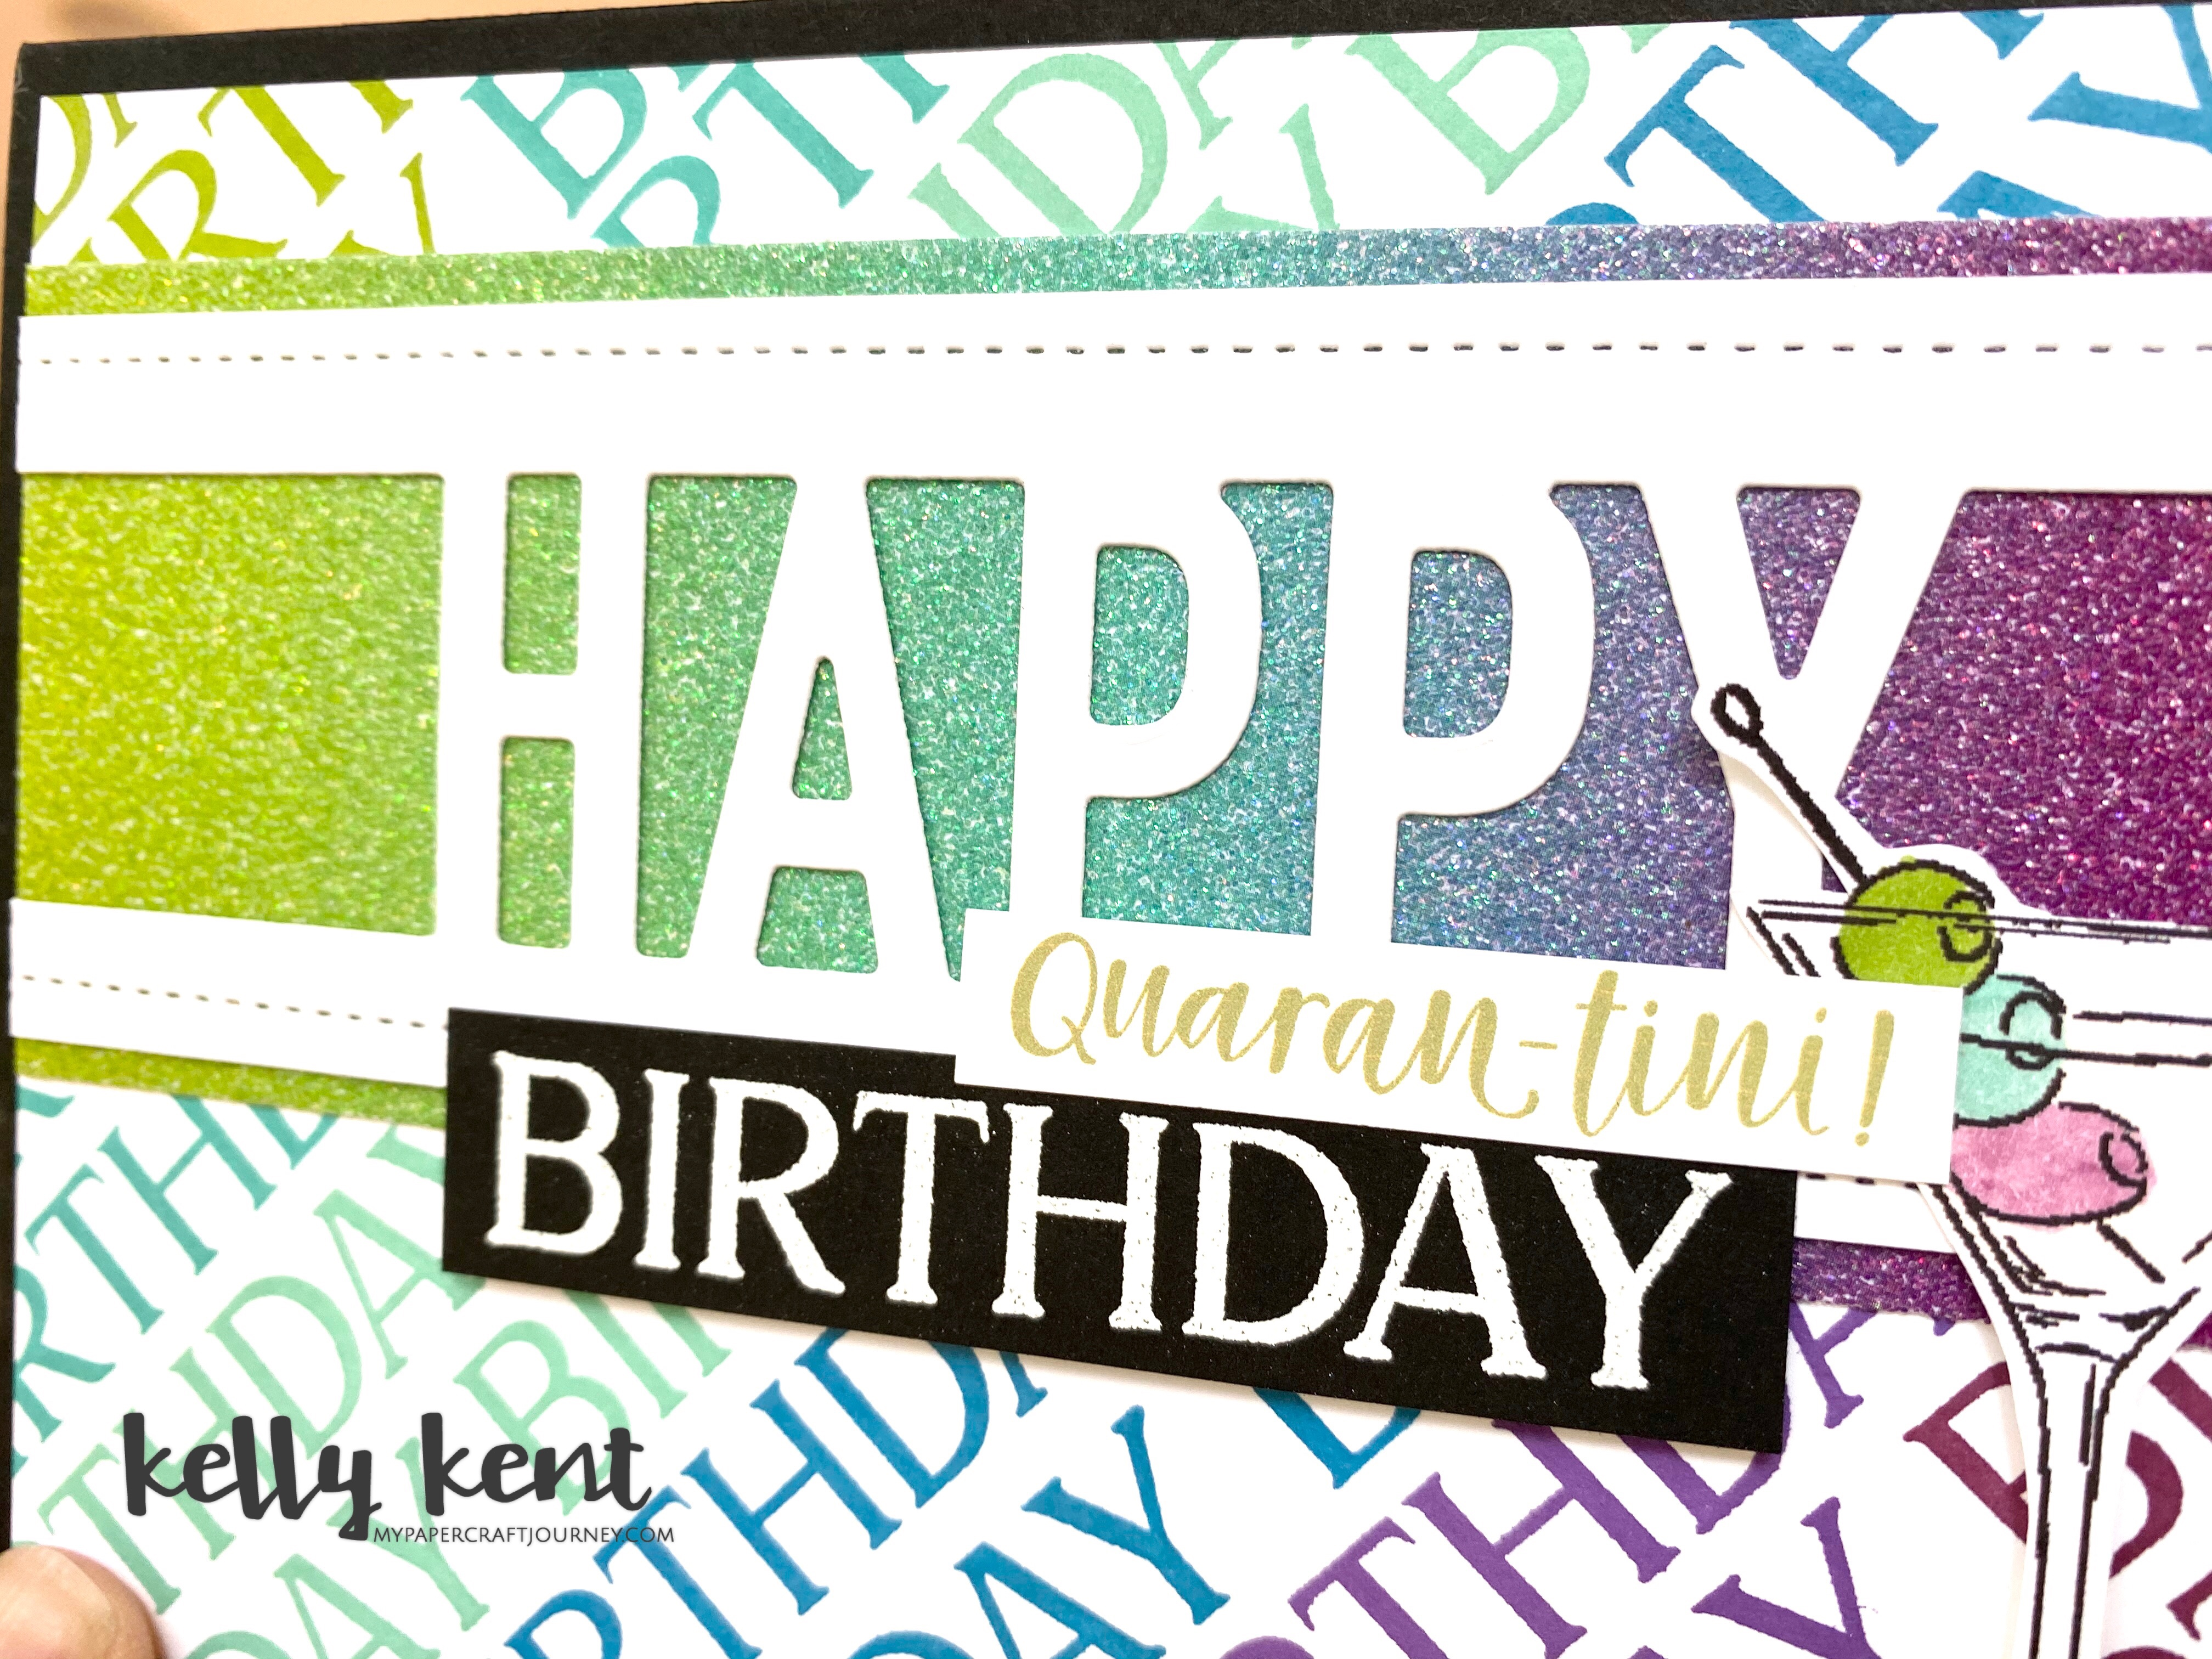 Happy Quarantini Birthday | kelly kent